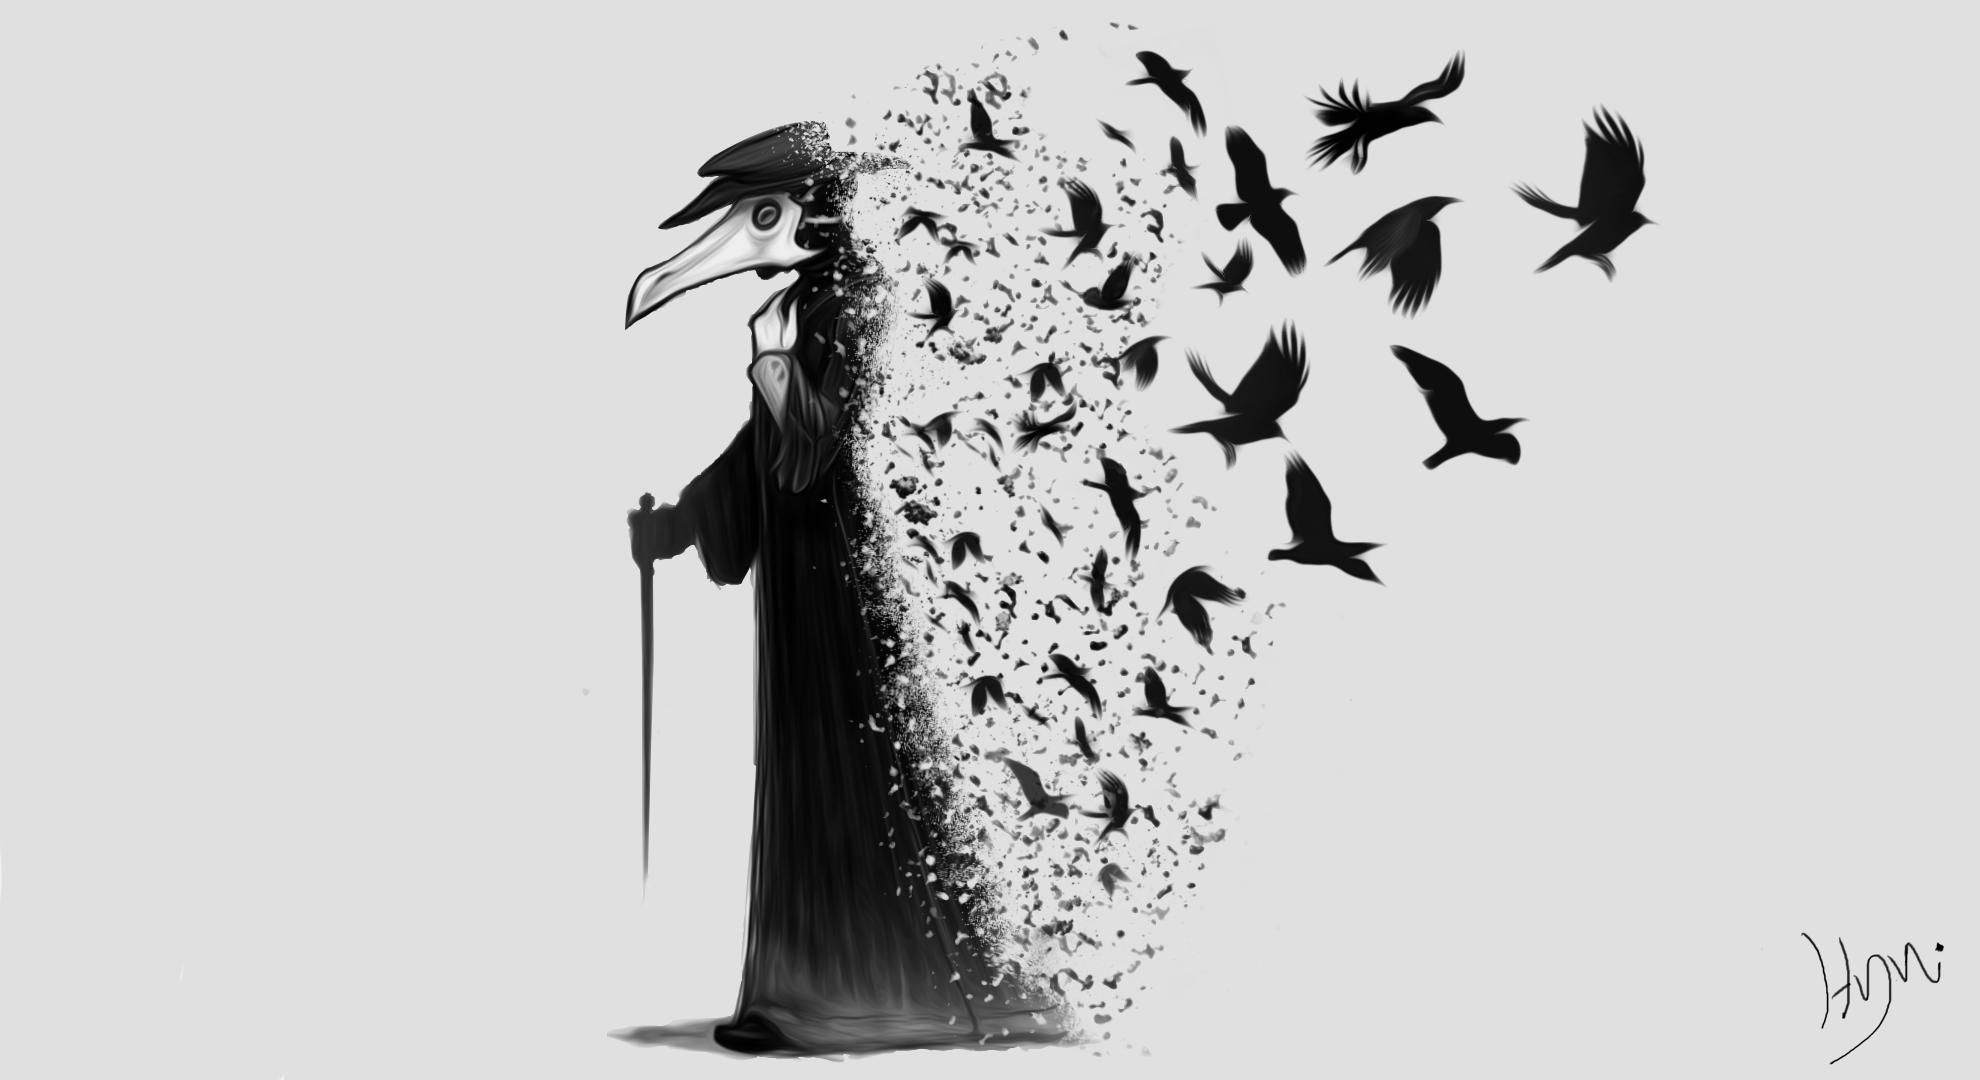 Plague Doctor Wallpapers - Wallpaper Cave